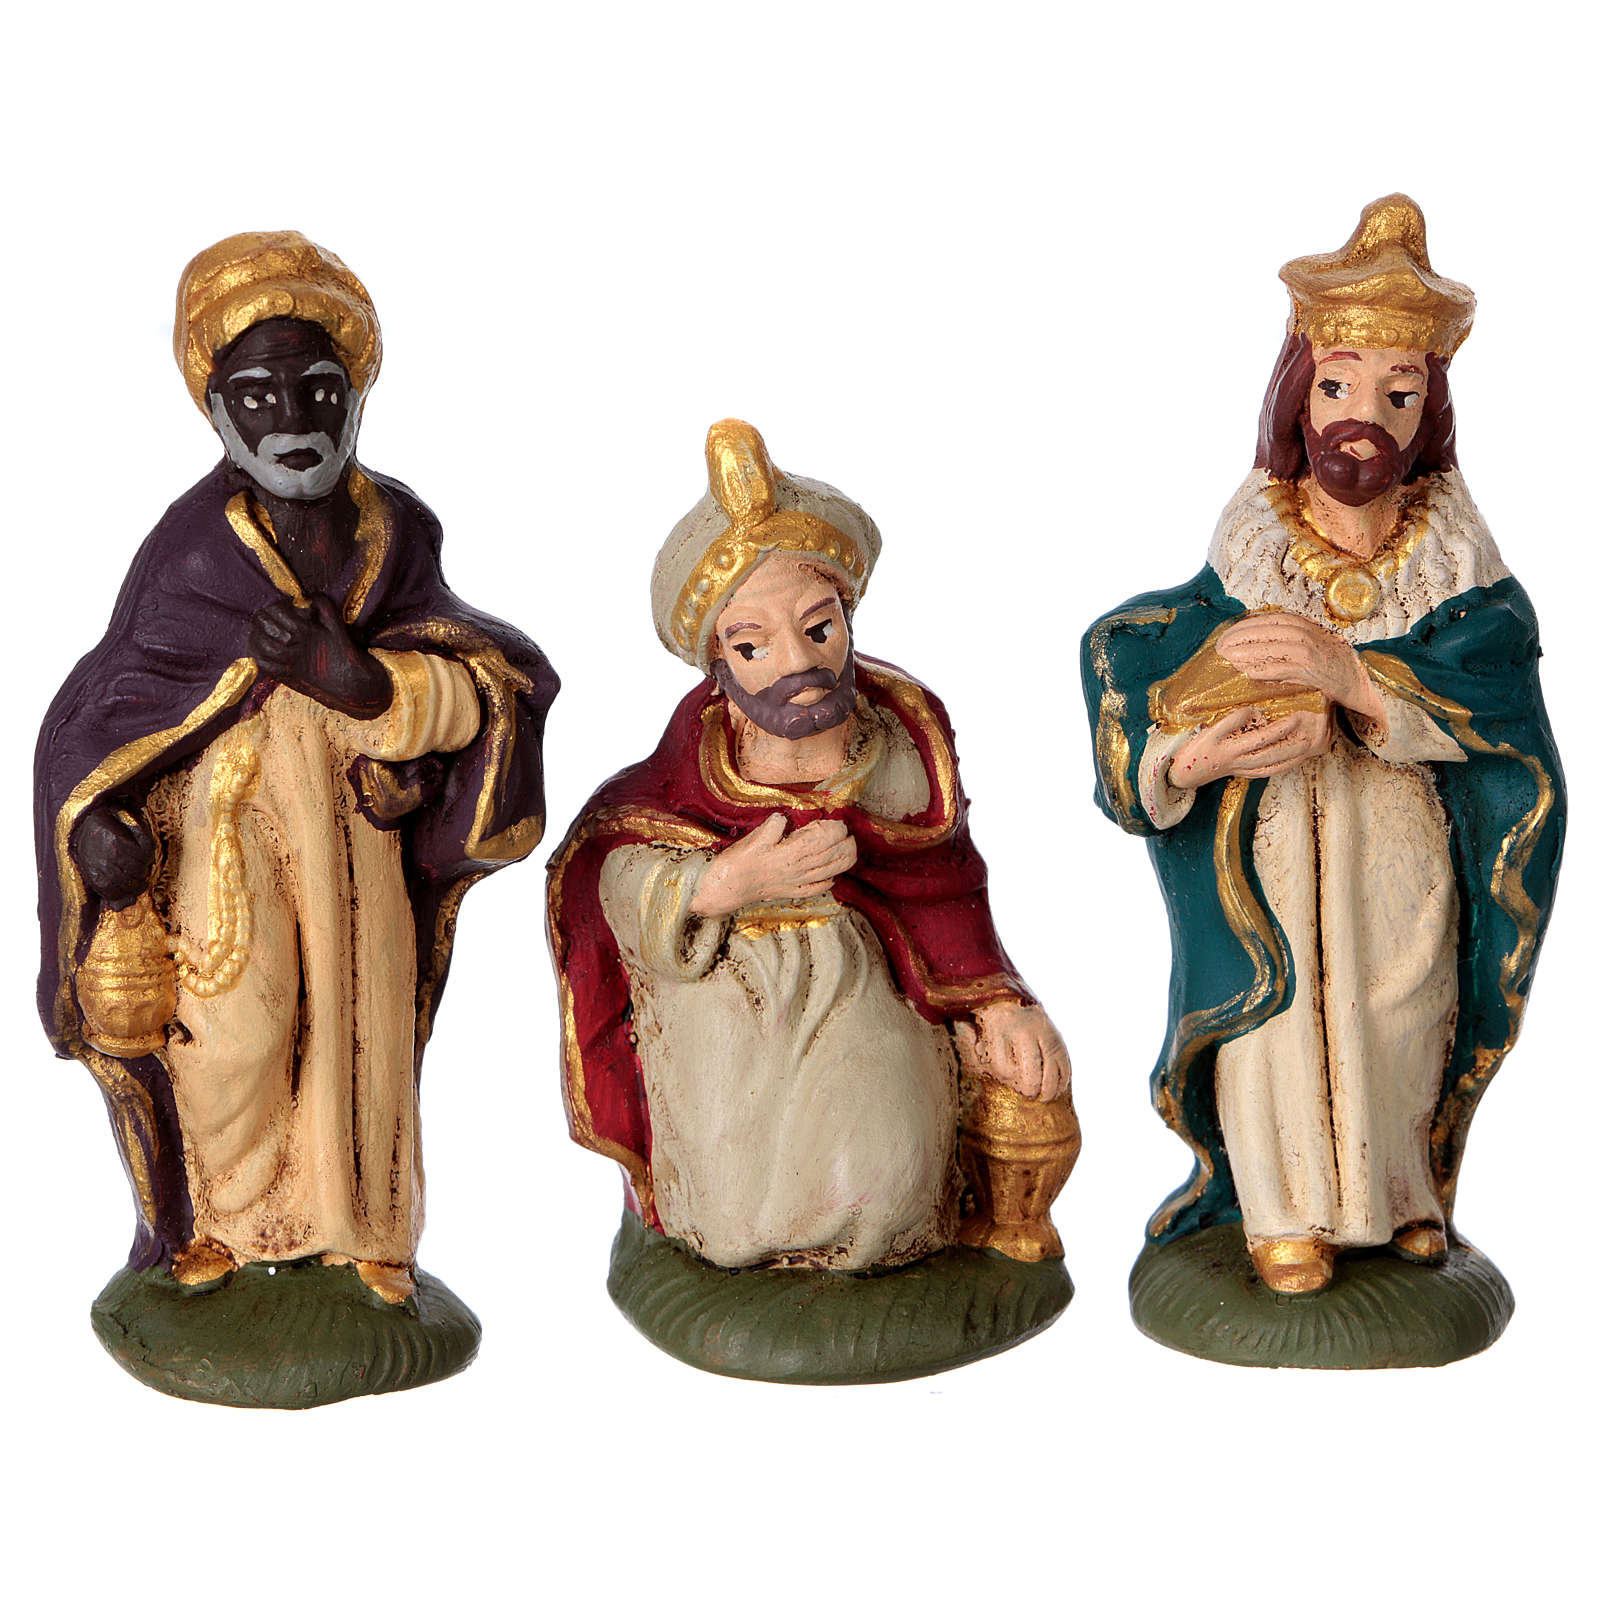 Presepe in terracotta Deruta colorata 10 statuine 10 cm 4